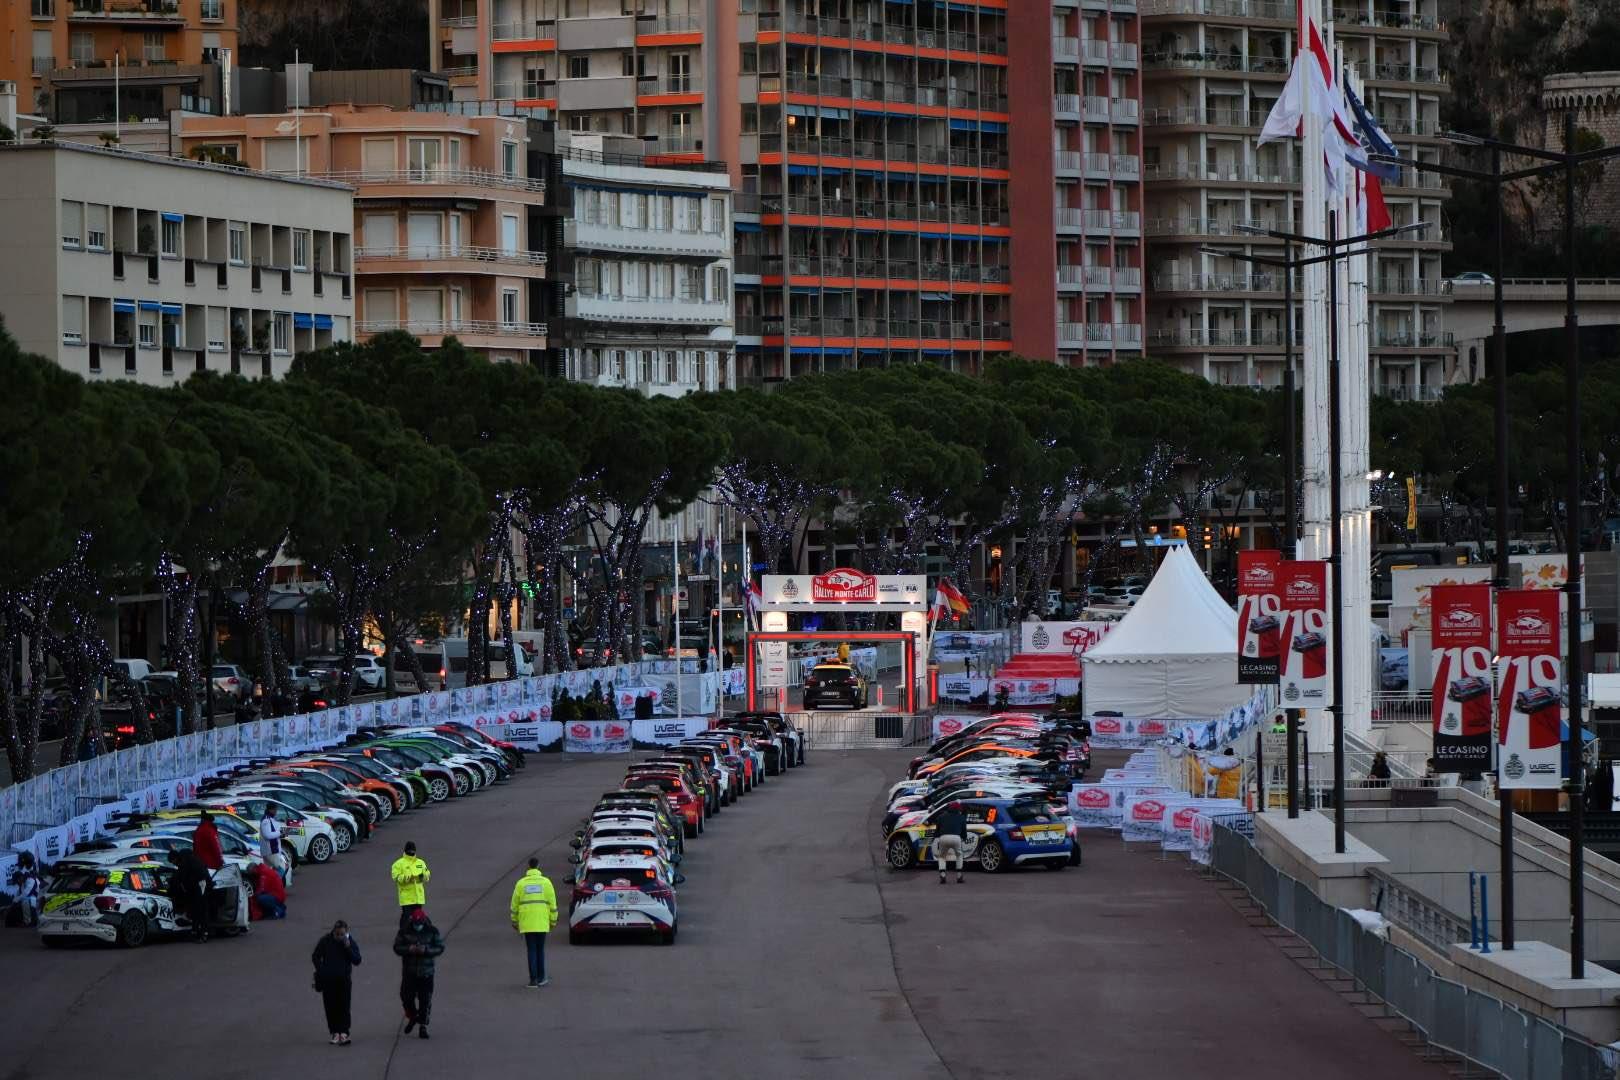 WRC: 89º Rallye Automobile de Monte-Carlo [18-24 Enero] - Página 13 EsbpUVcXEAEZGVk?format=jpg&name=large